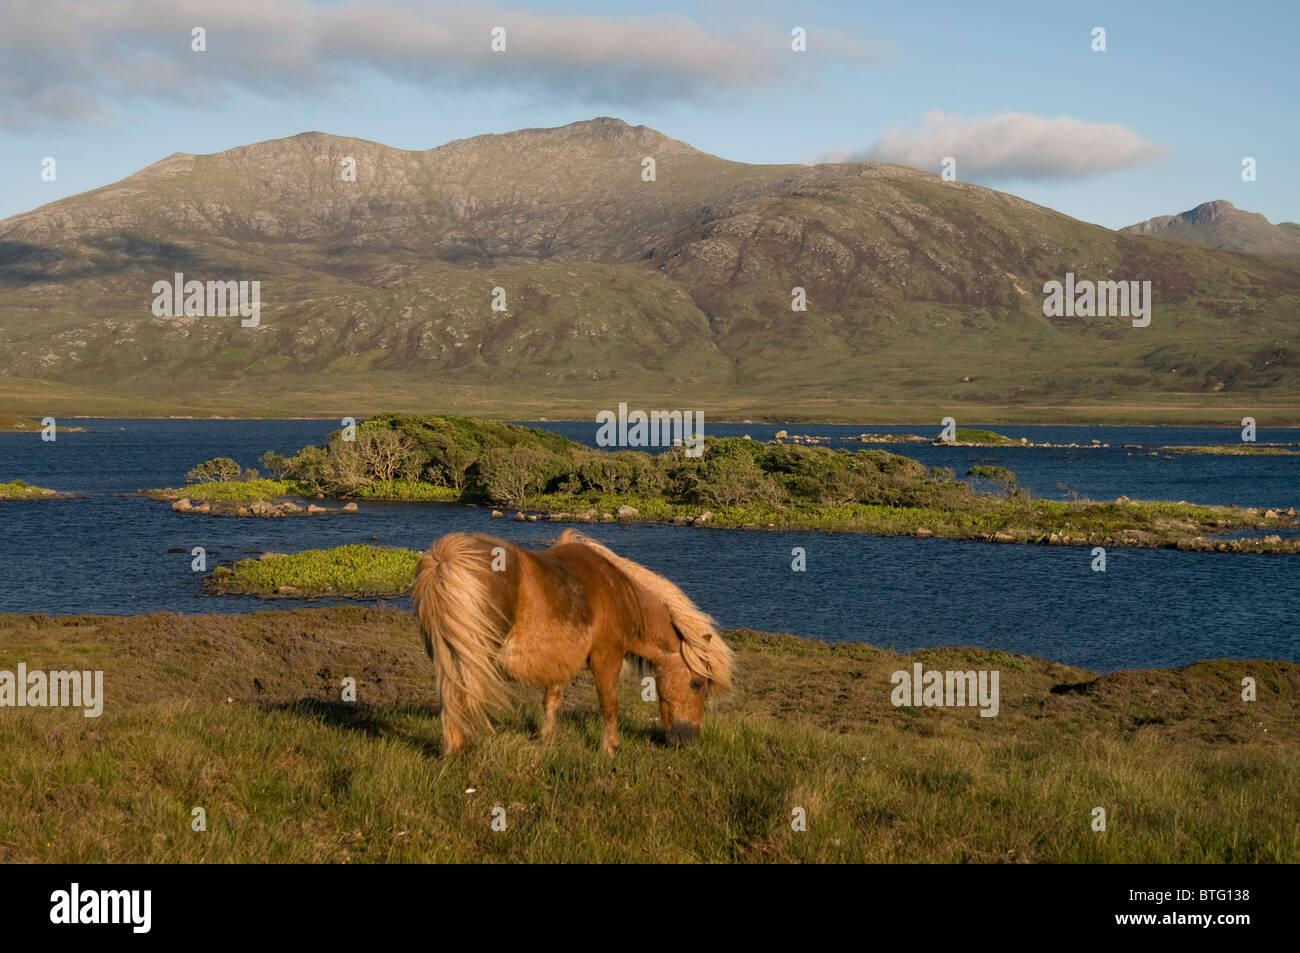 Loch Druidibeg South Uist, Outer Hebrides, Western Isles, Scotland. SCO 6962 - Stock Image